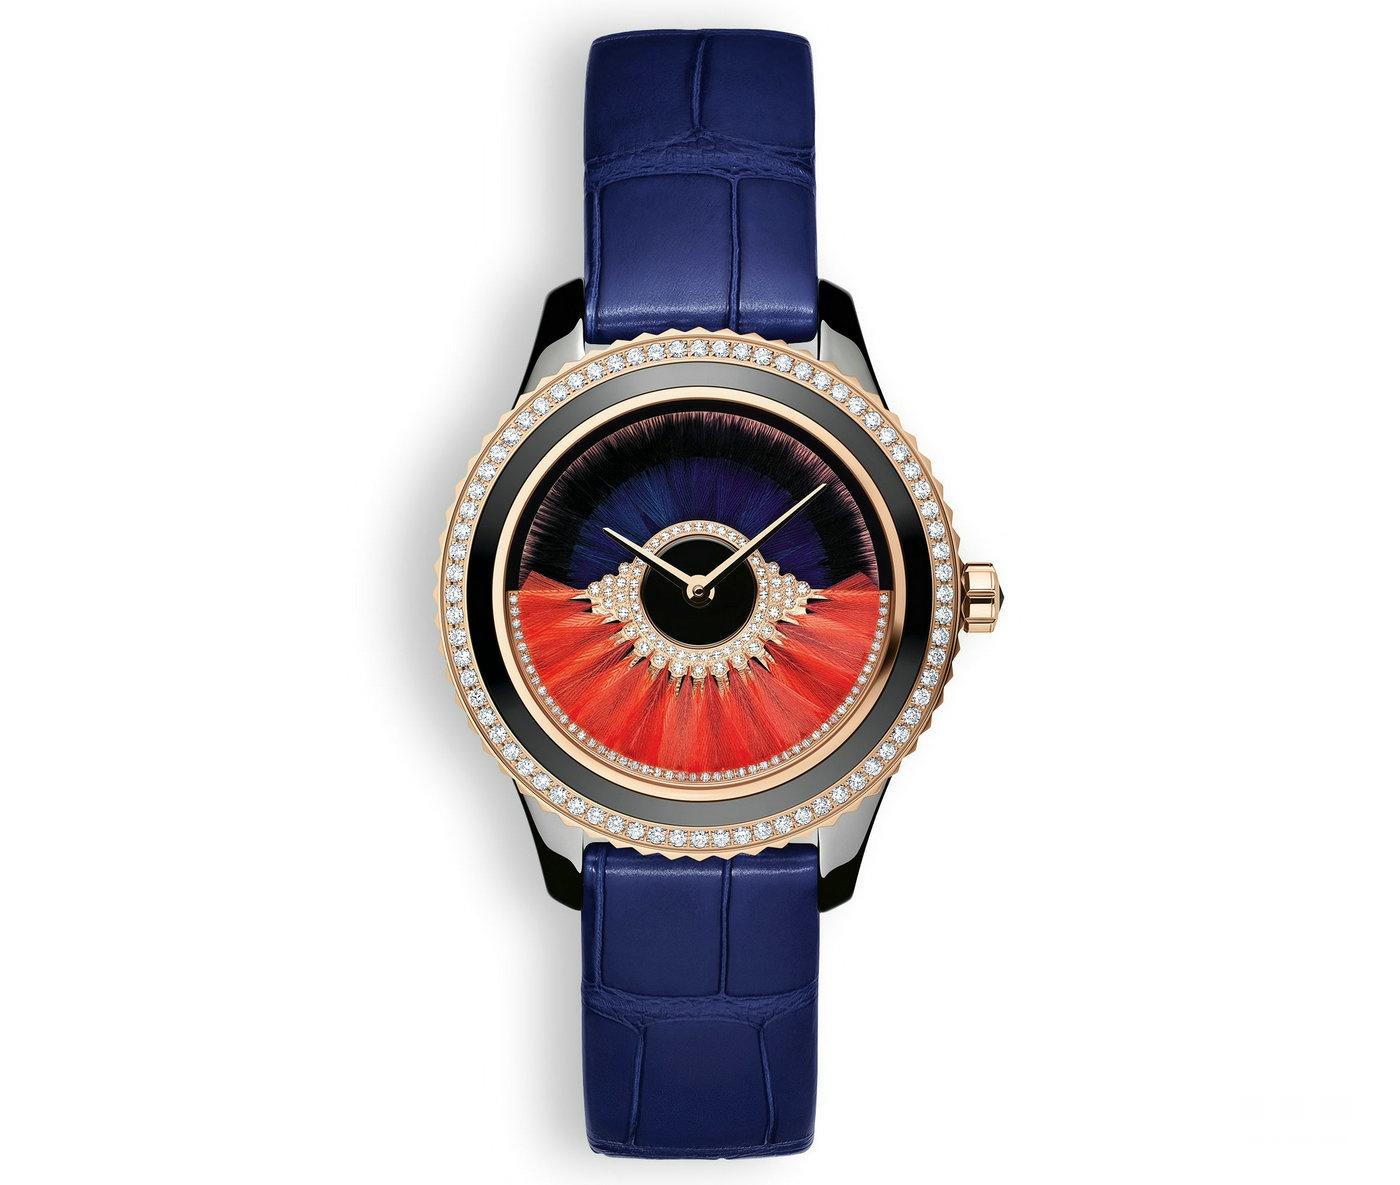 腕上的舞会:Dior VIII Grand Bal Cancan腕表